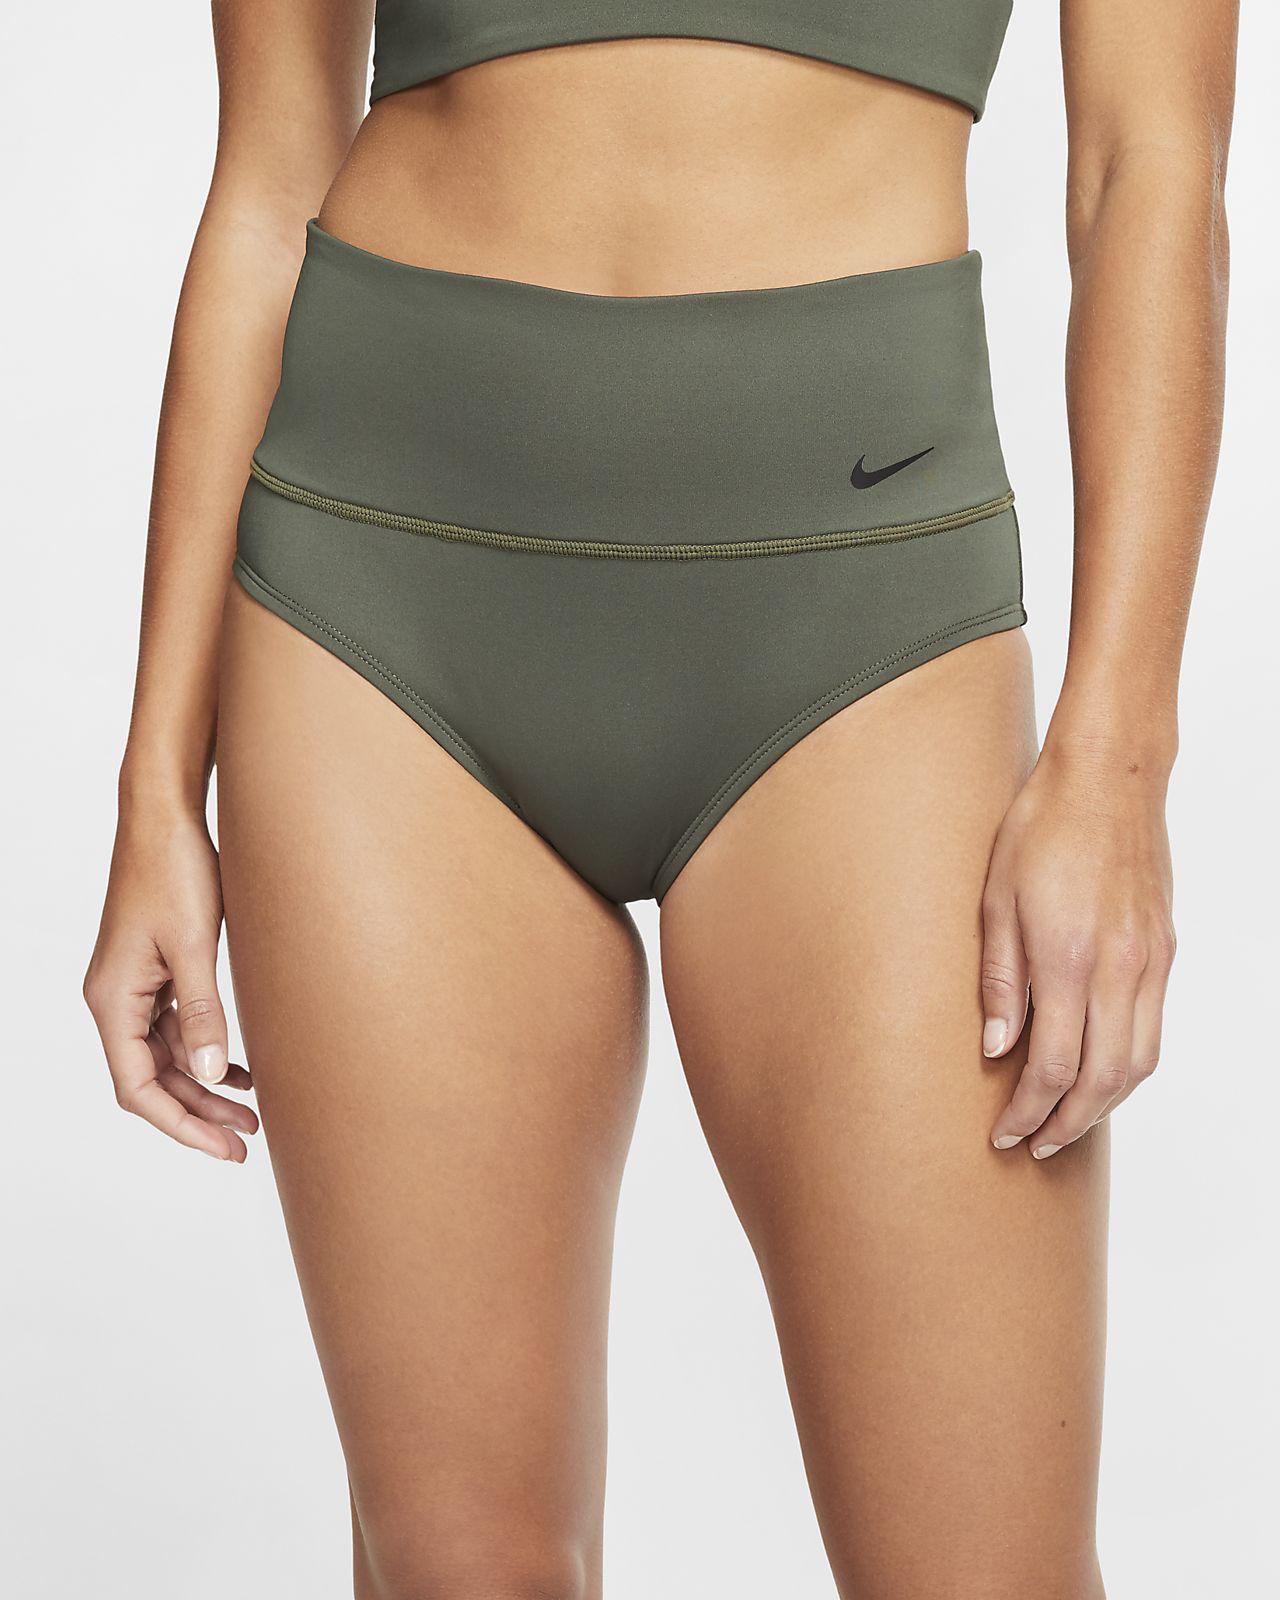 Nike Essential Women's High-Waisted Swim Bottoms